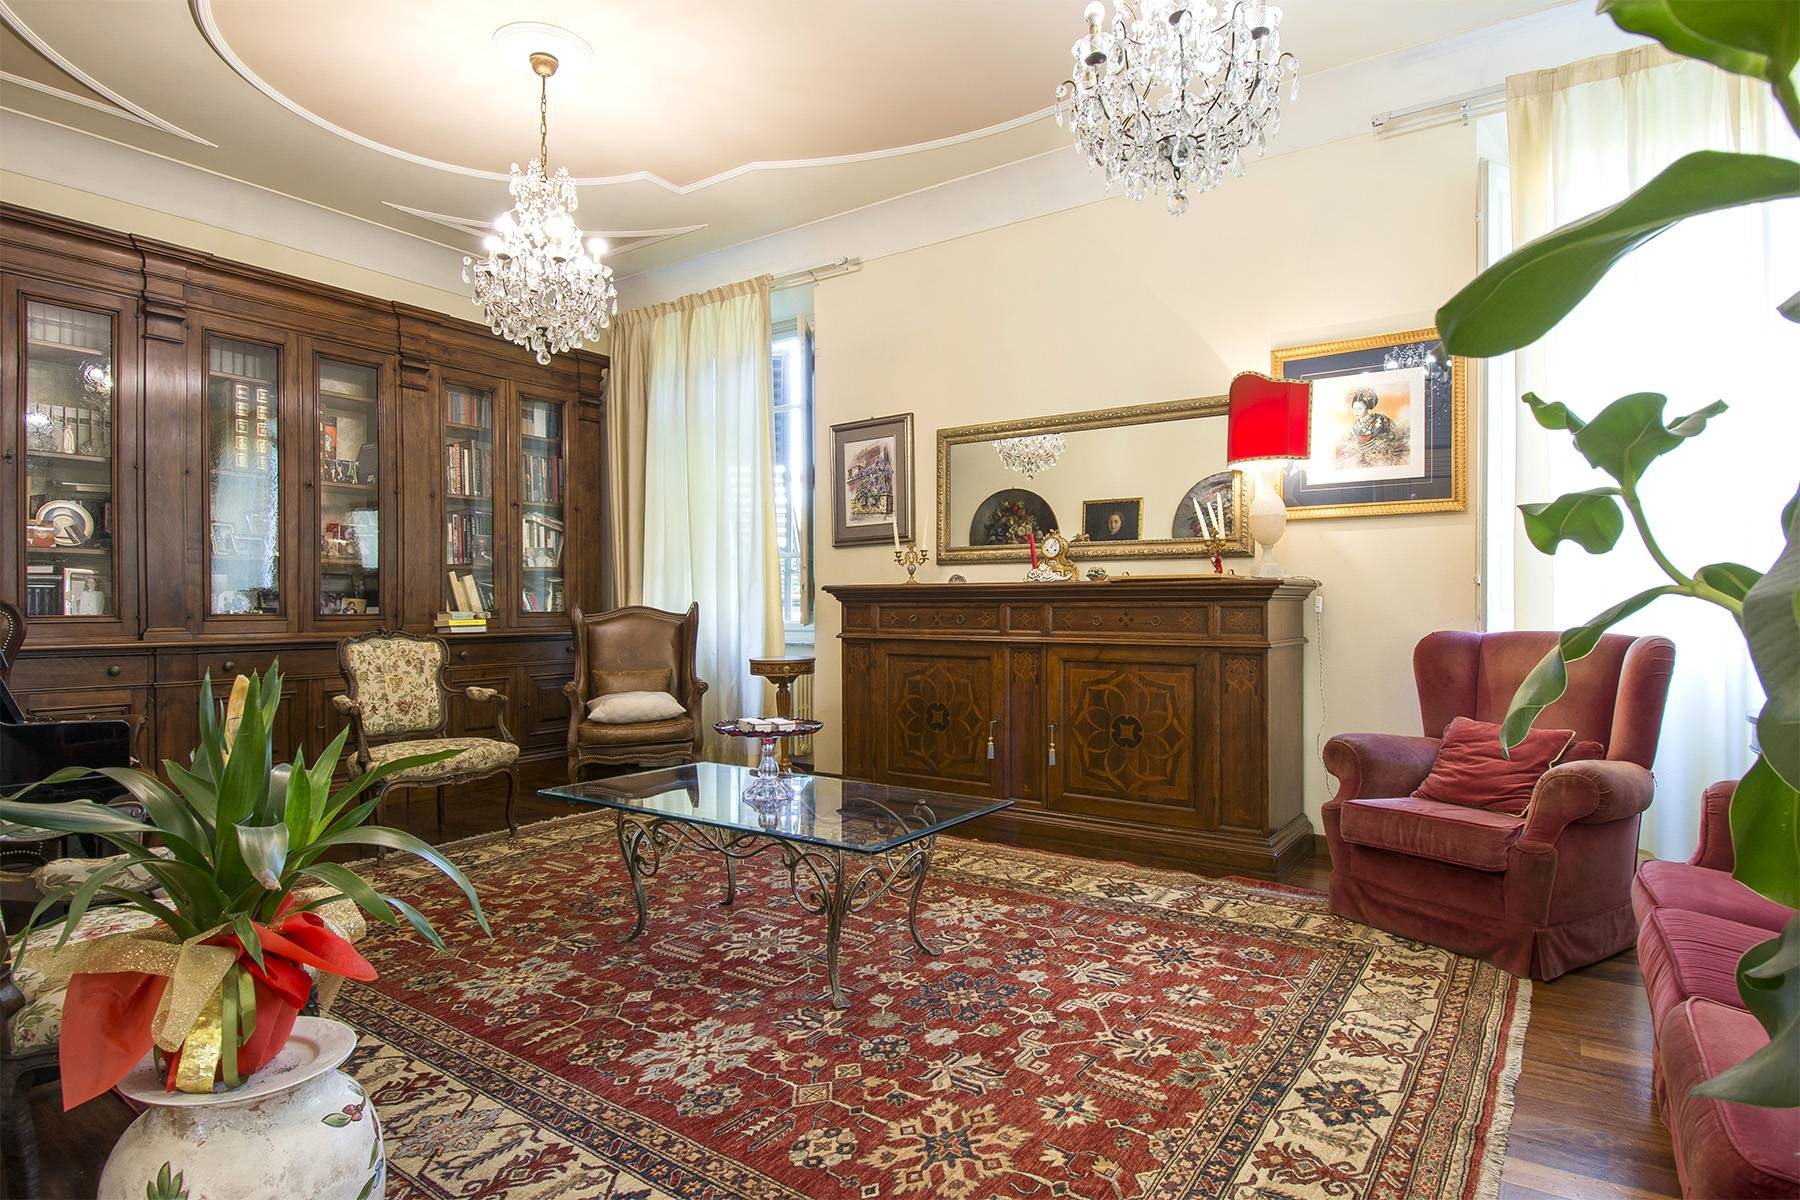 Villa in Vendita a Lucca: 5 locali, 350 mq - Foto 4